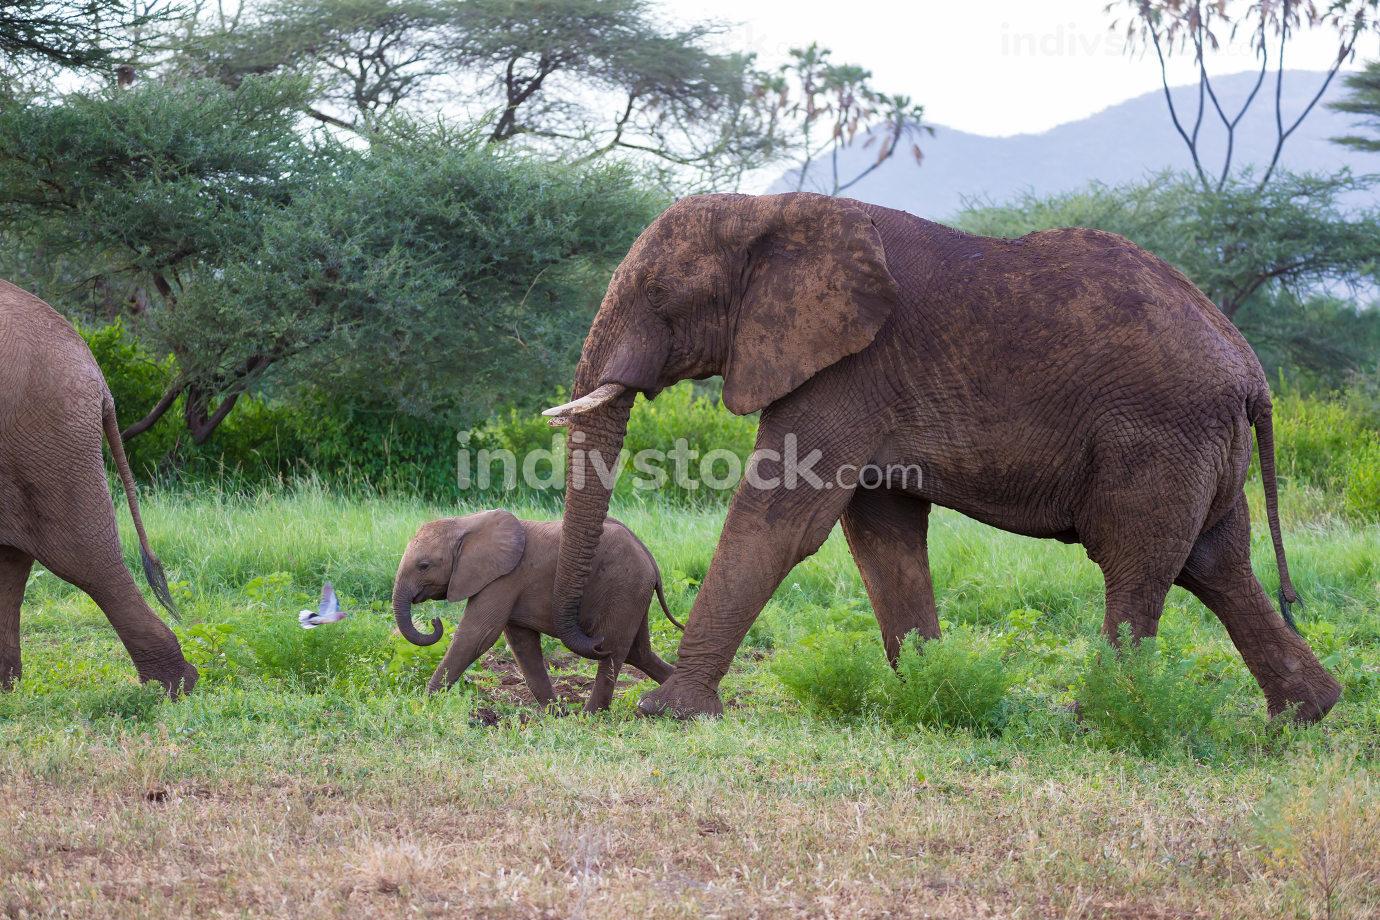 Elephants walk among the trees and shrubs